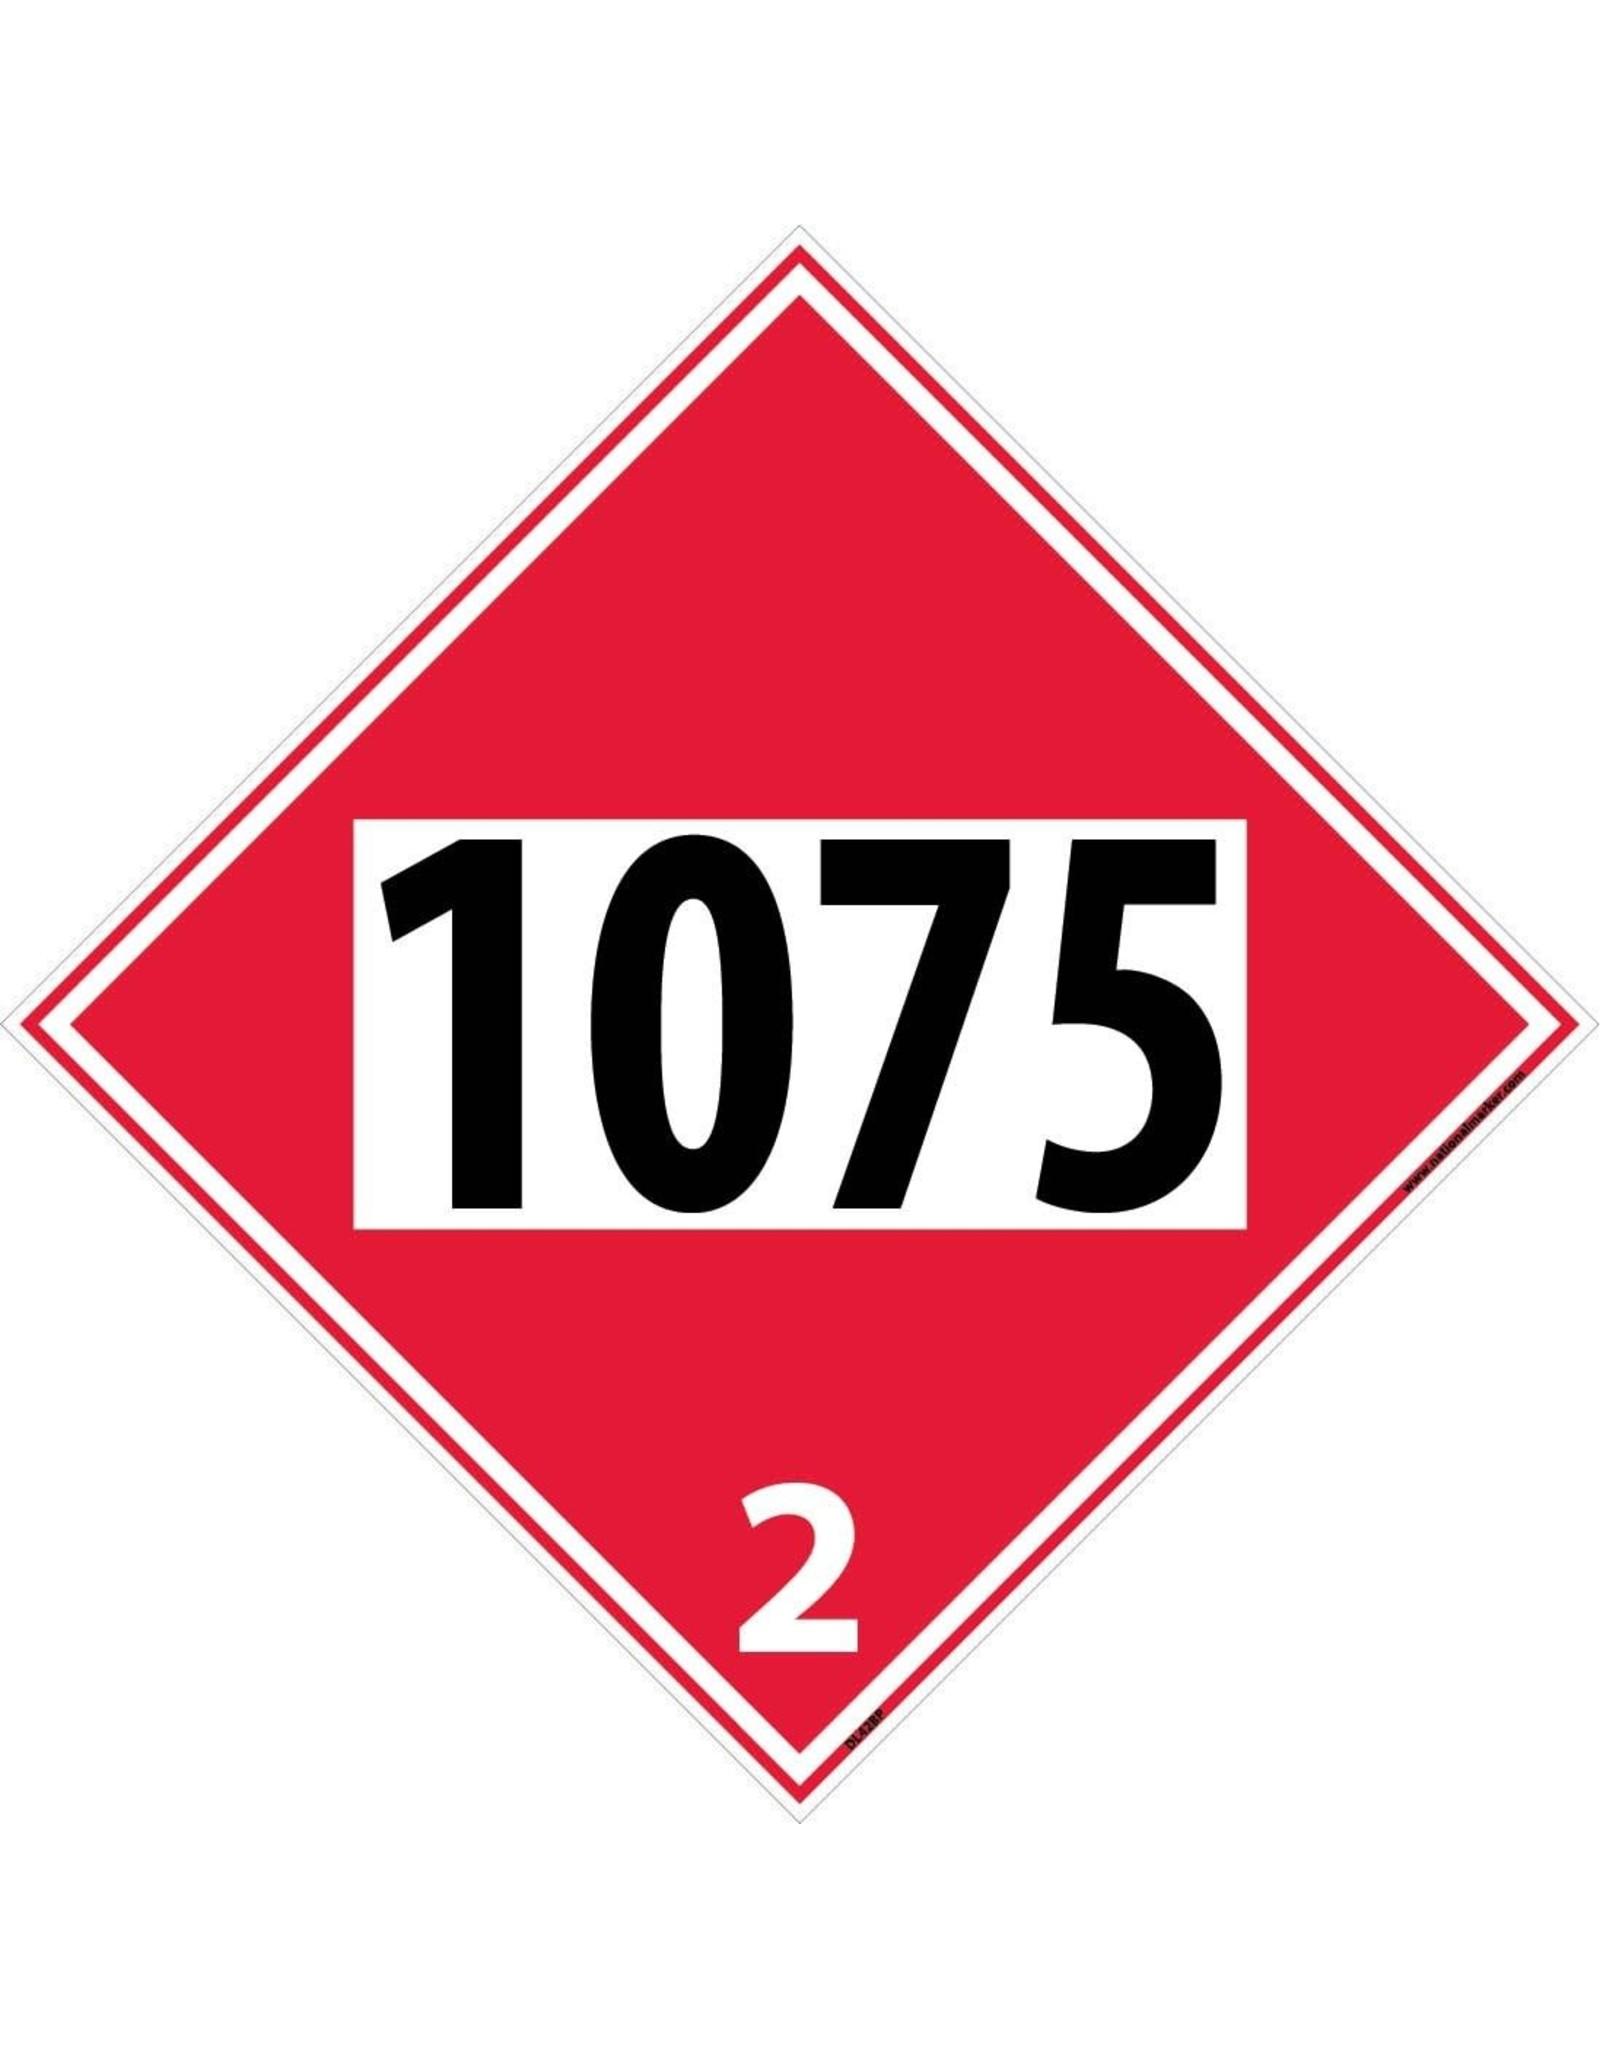 National Marker Company Propane Diamond Hazmat Placard 1075-2